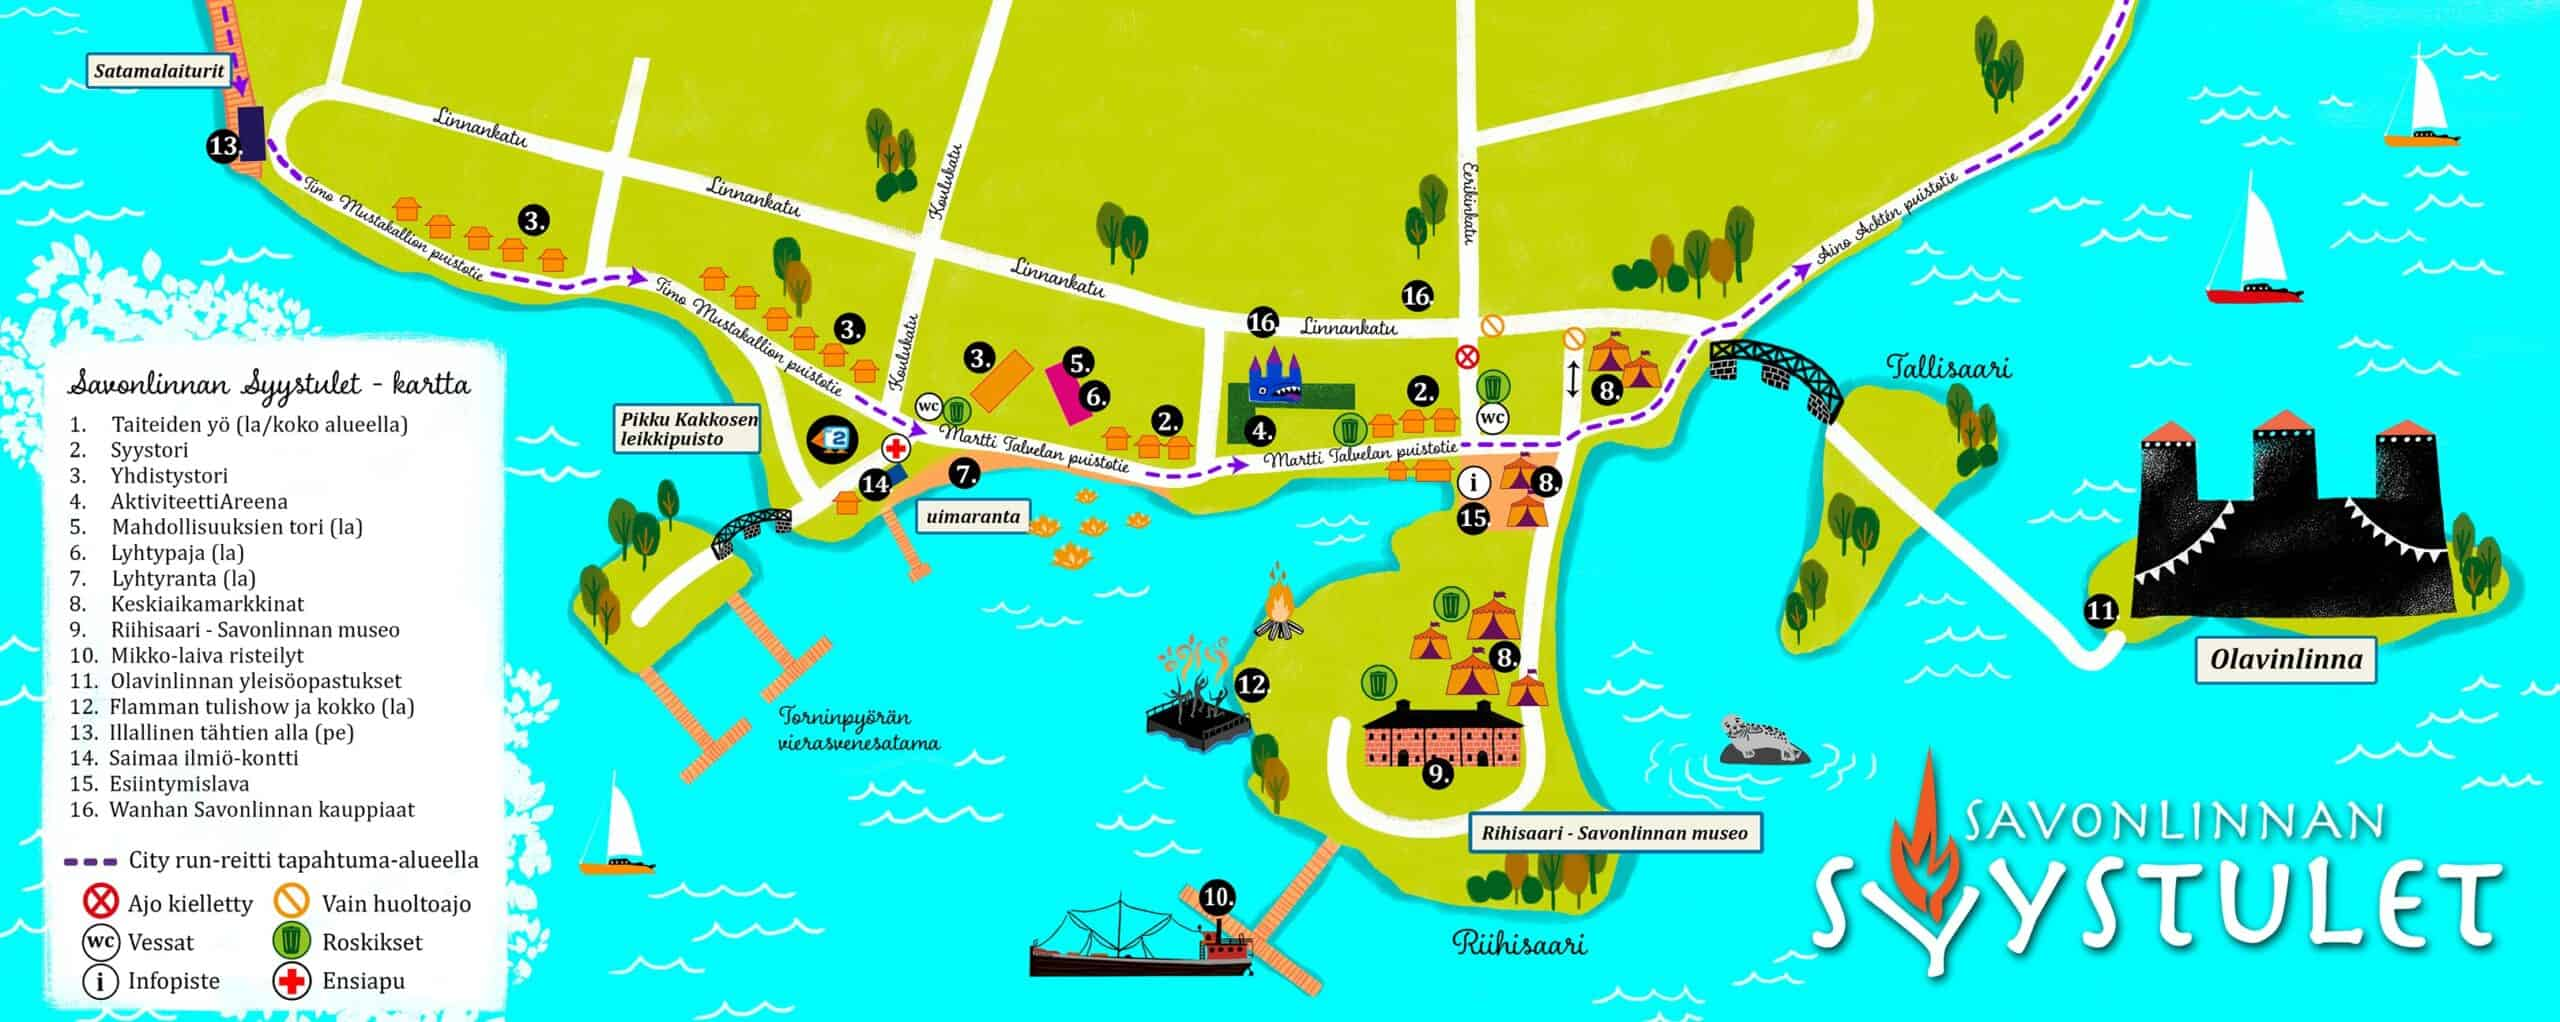 Kartta 2021